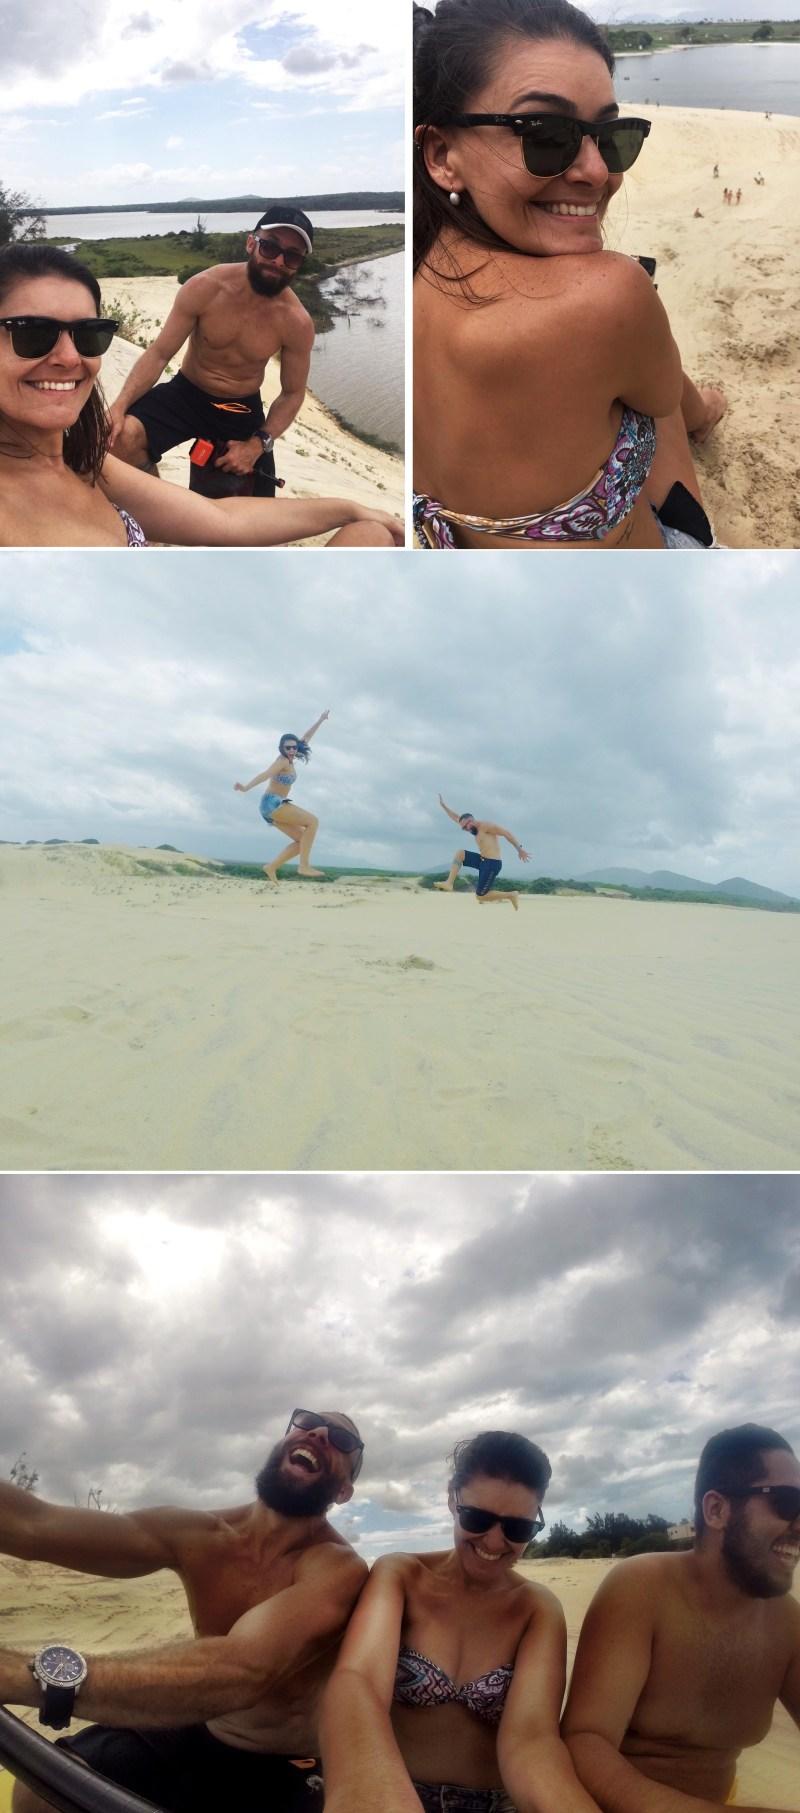 praia-do-cumbuco